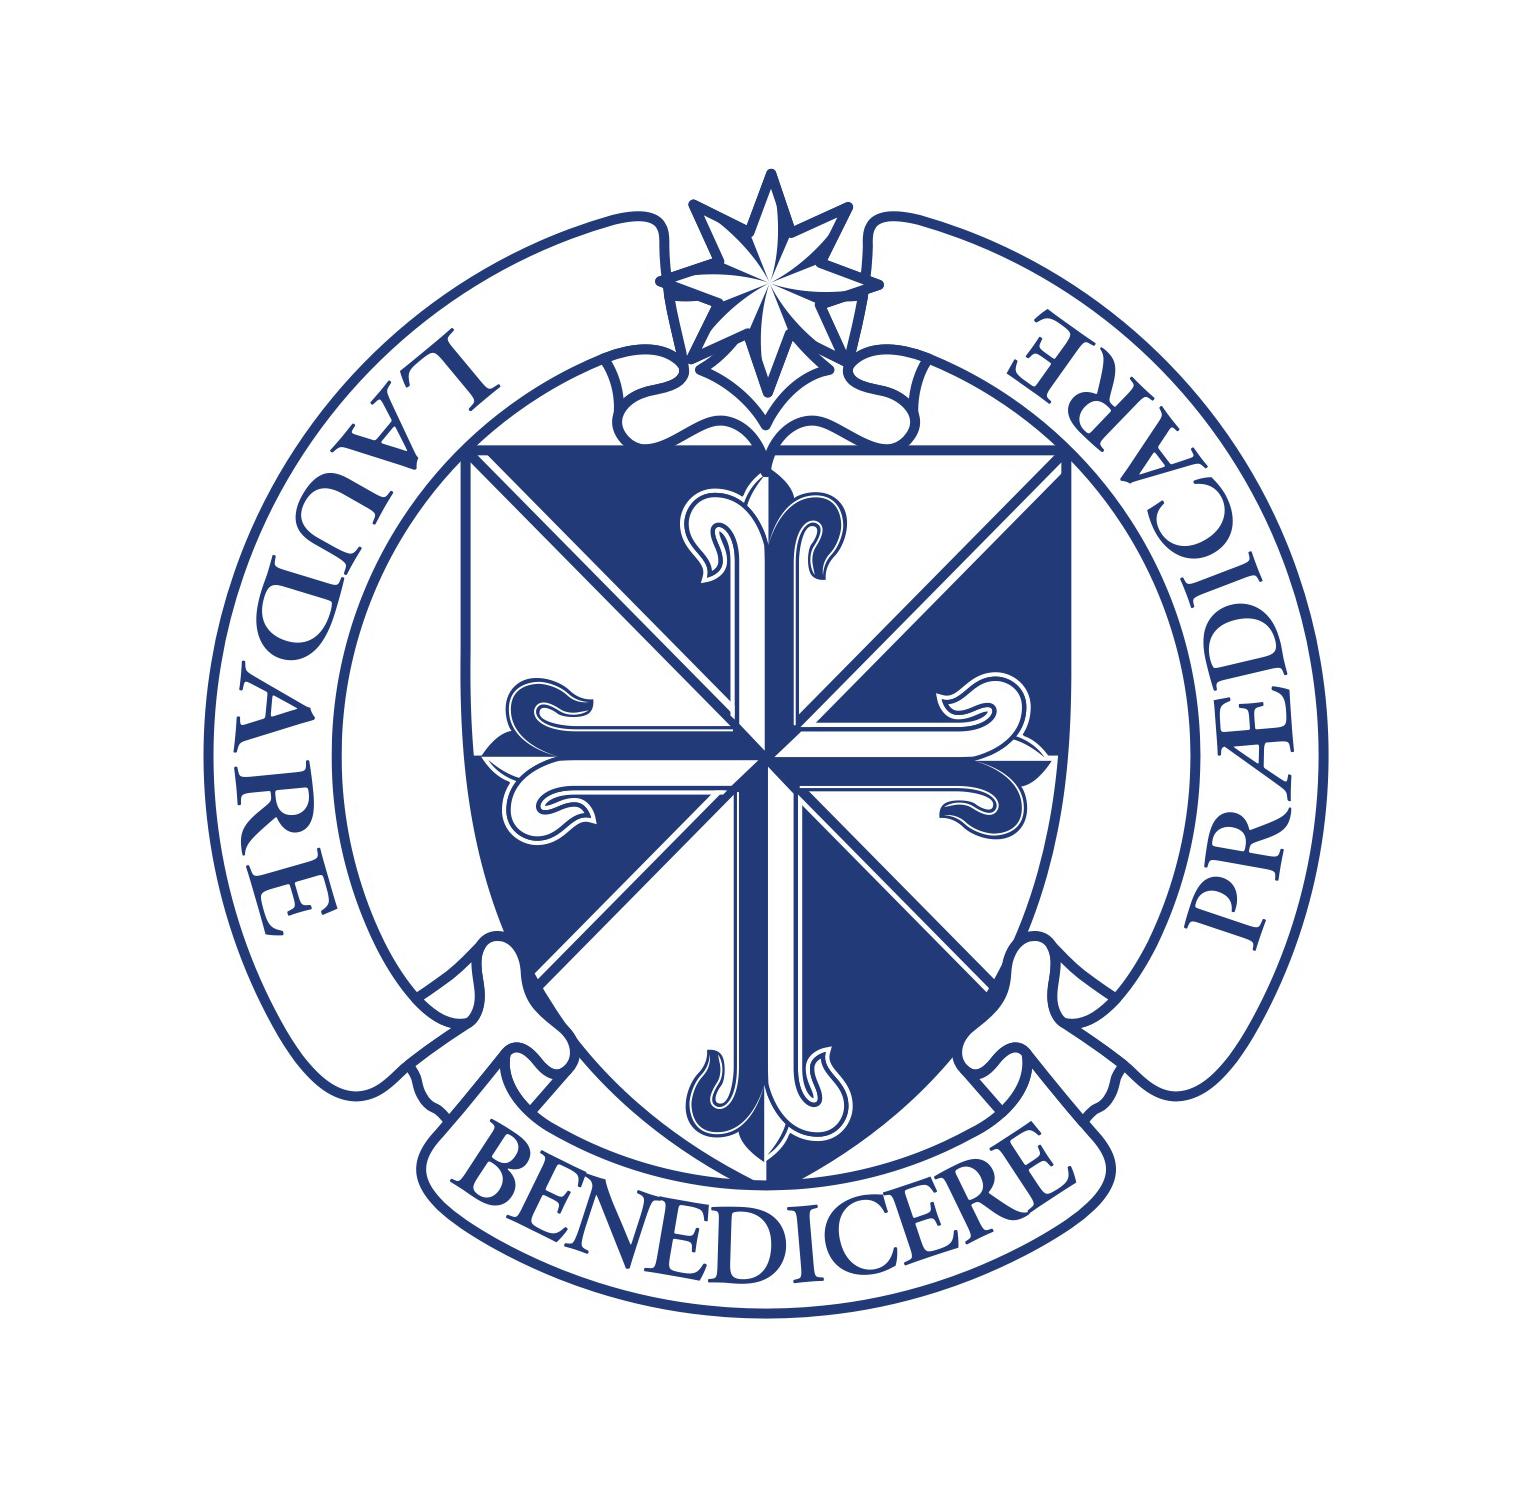 Aftercare billing saints john and paul school saints john and paul school buycottarizona